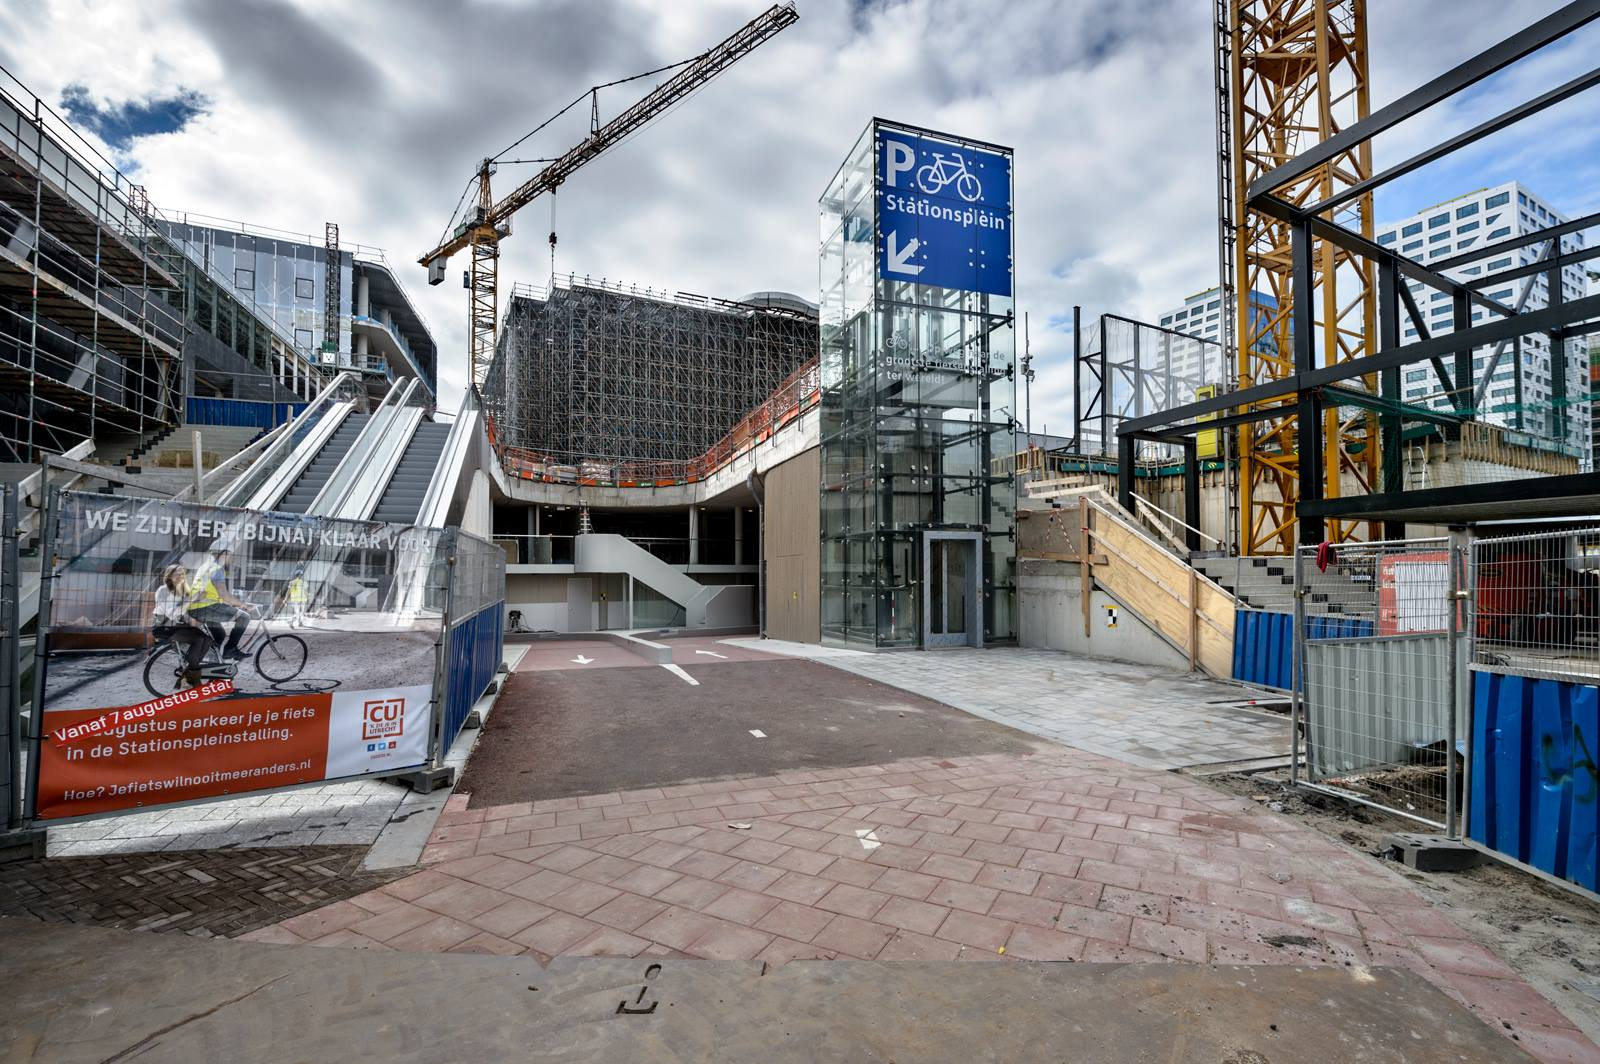 Fietsenstalling Stationsplein Gemeente Utrecht